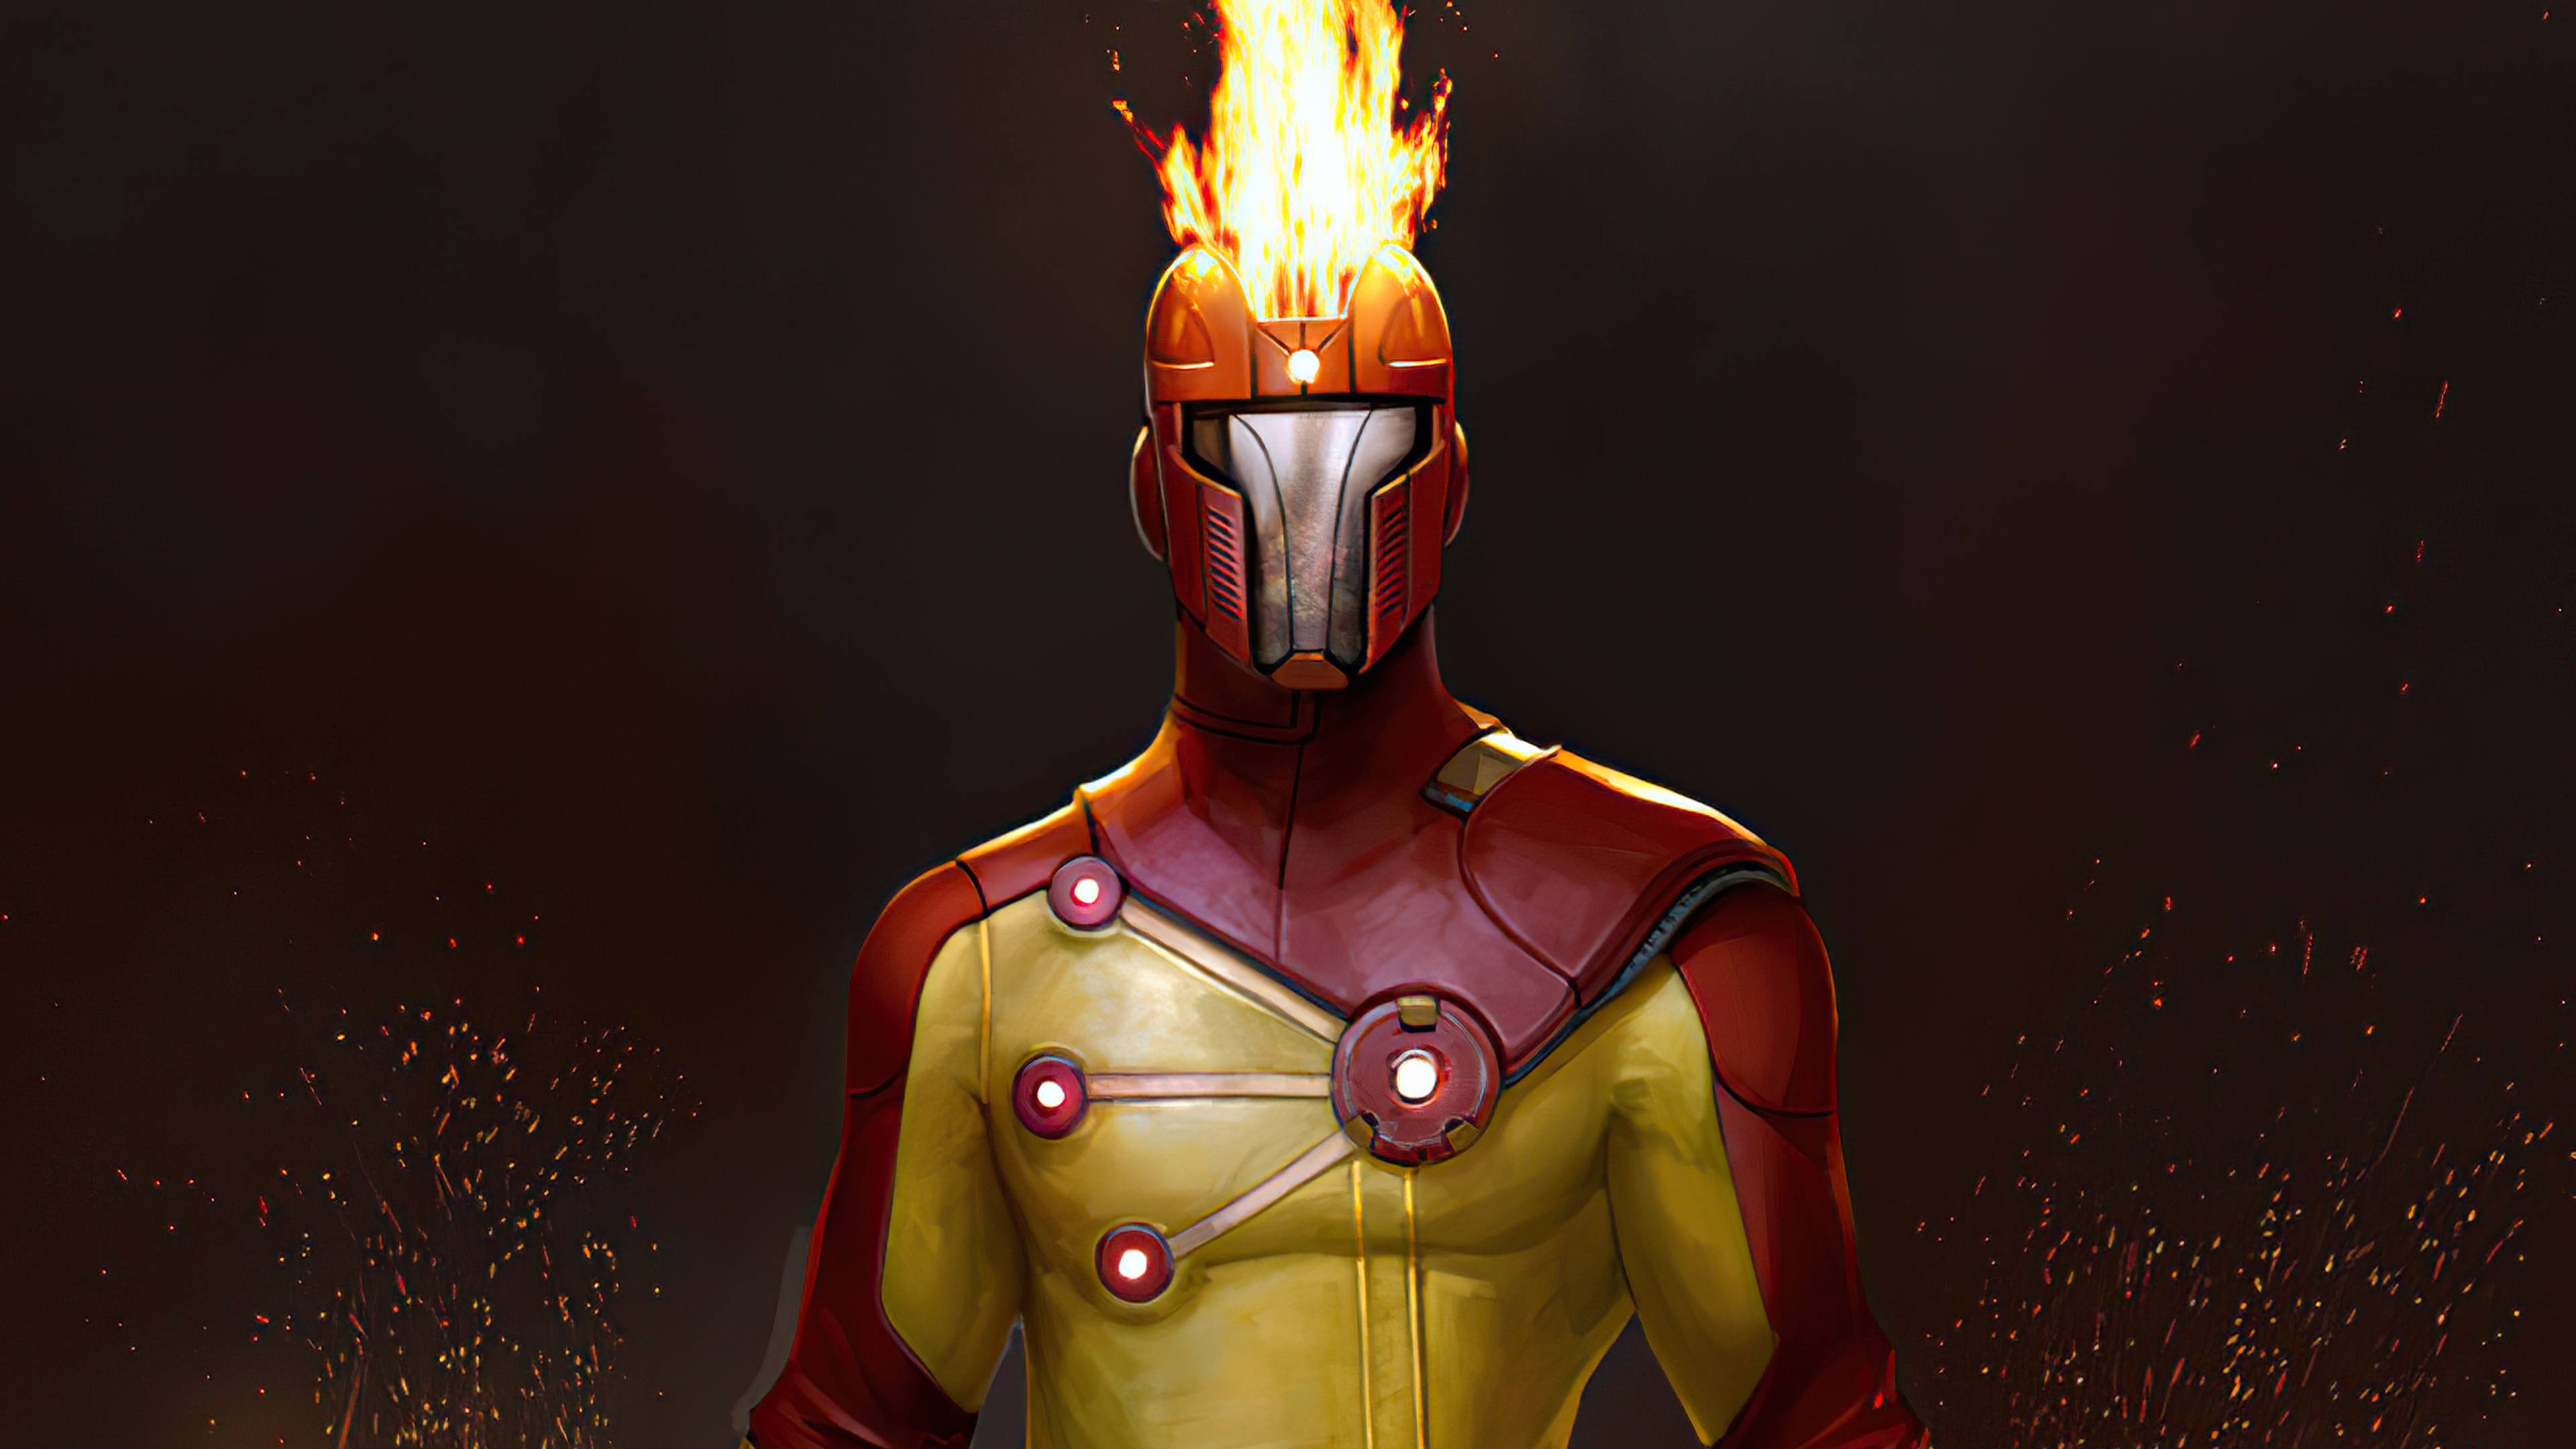 injustice2-firestorm-4k-te.jpg